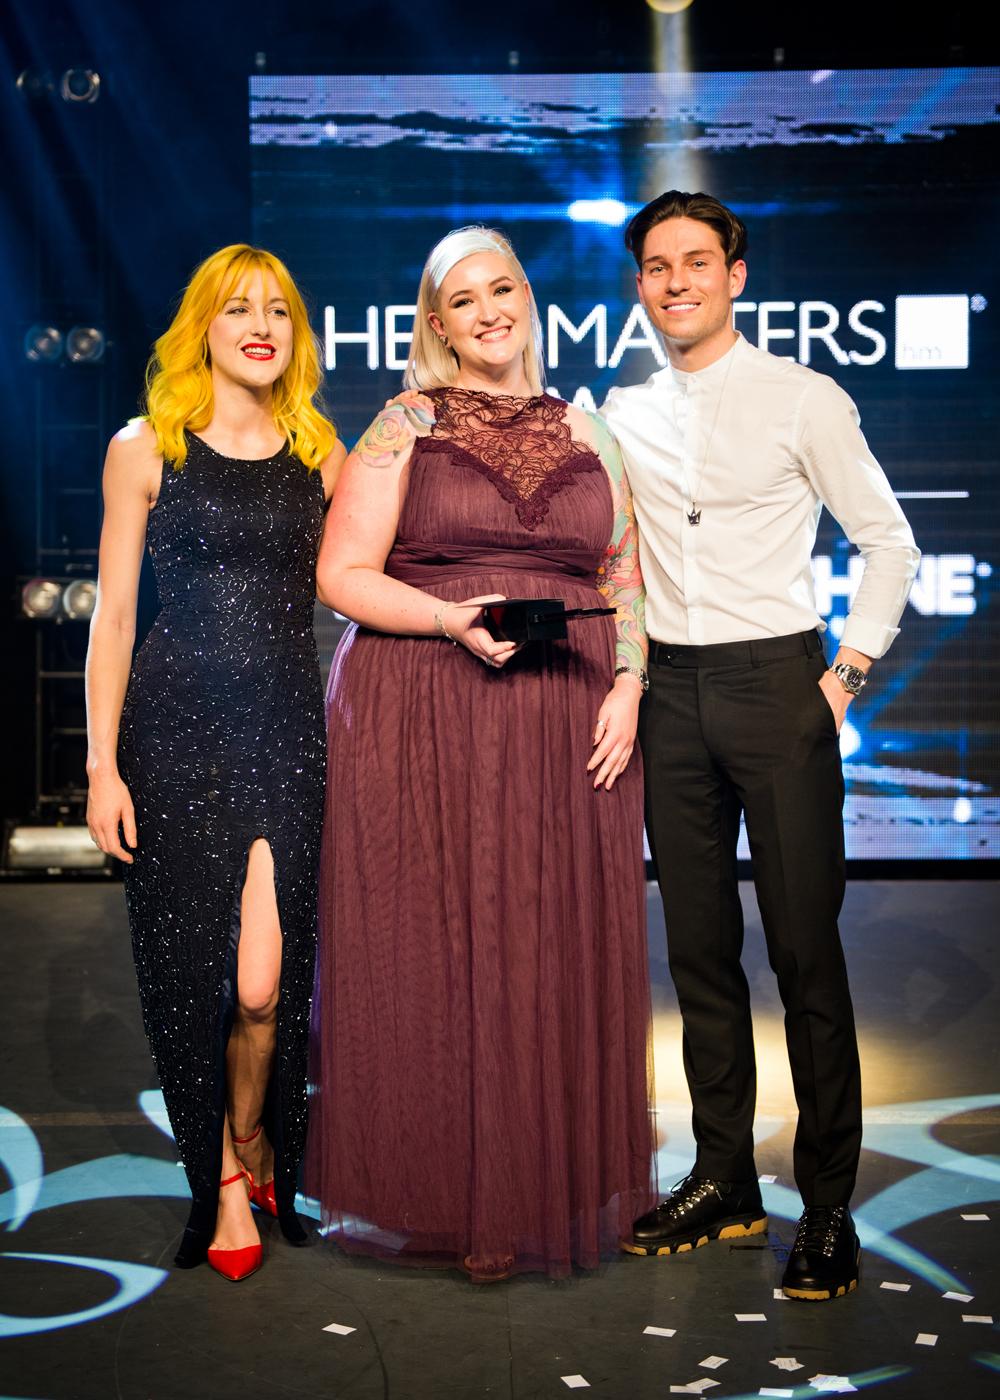 Creative-Award-Runner-up-Kat-Facer-from-Reading